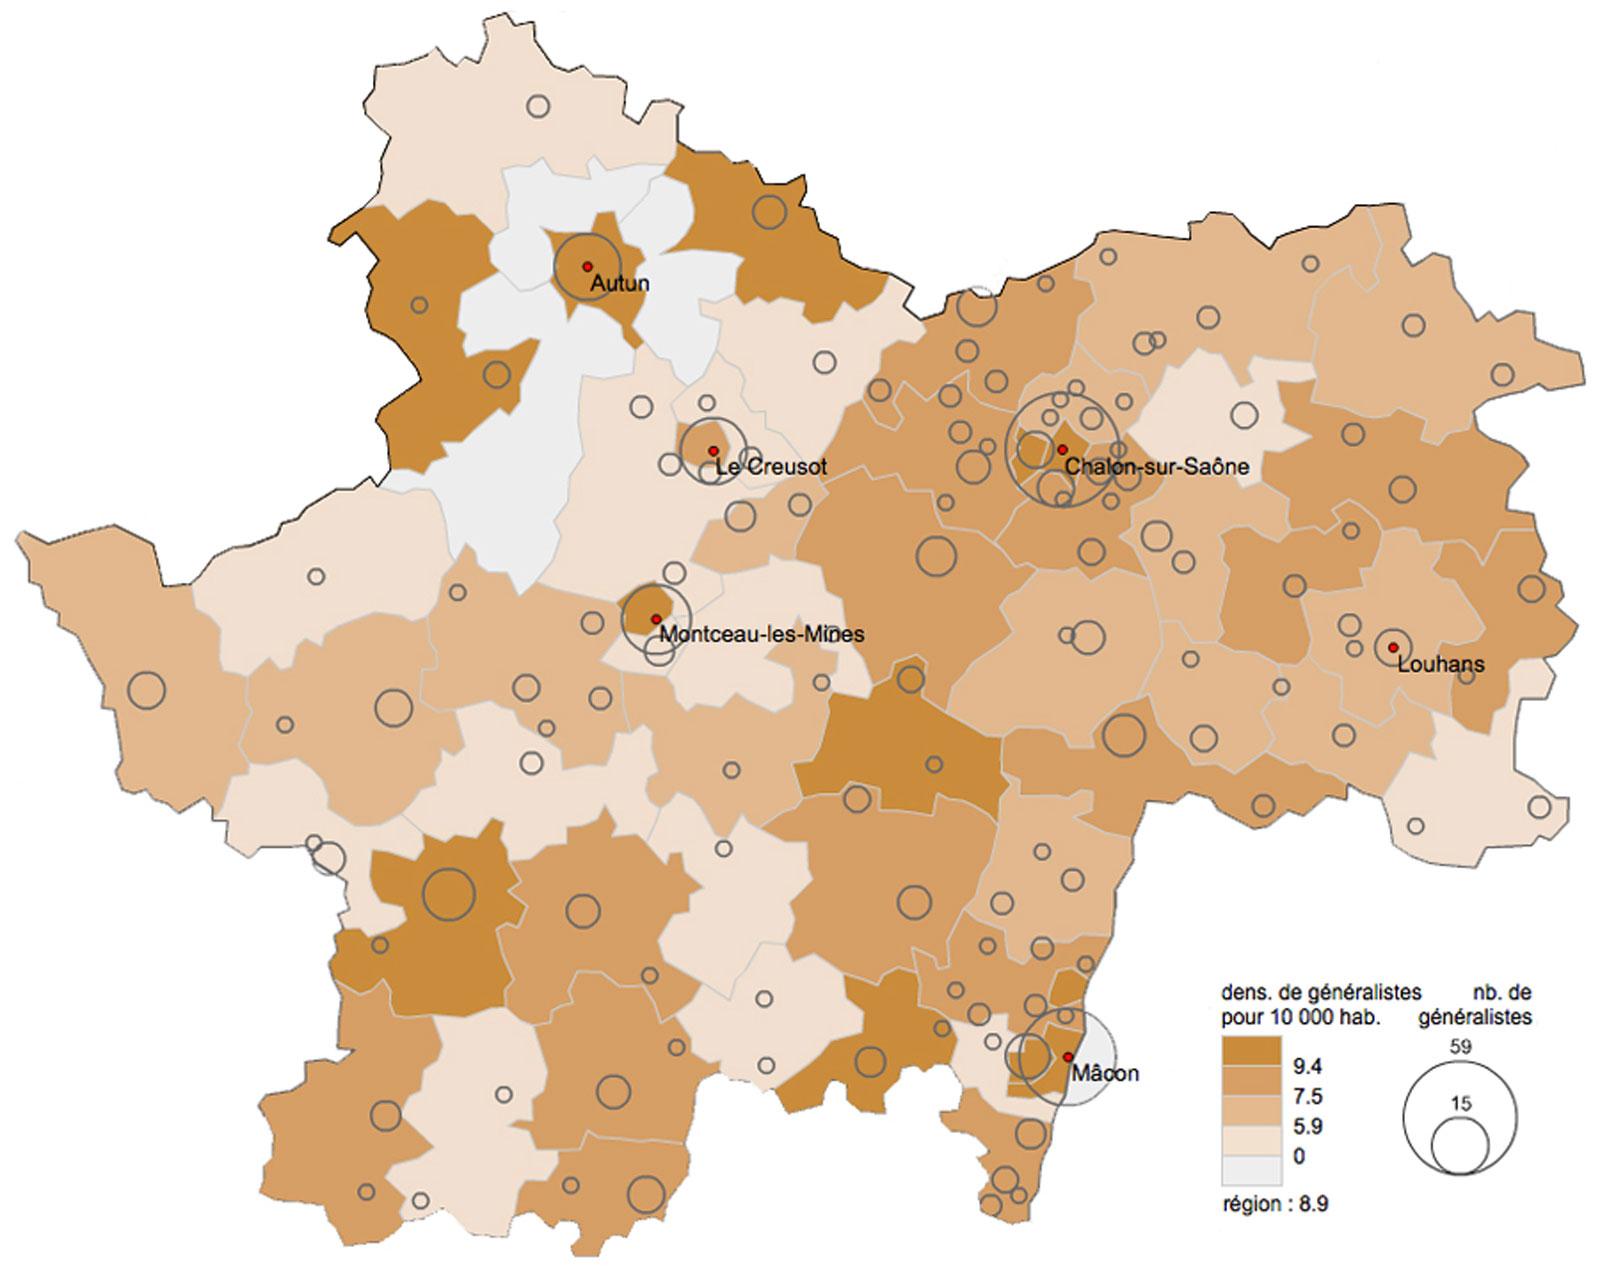 carte-densite-medecins-generalistes-saone-et-loire-2011-urcam